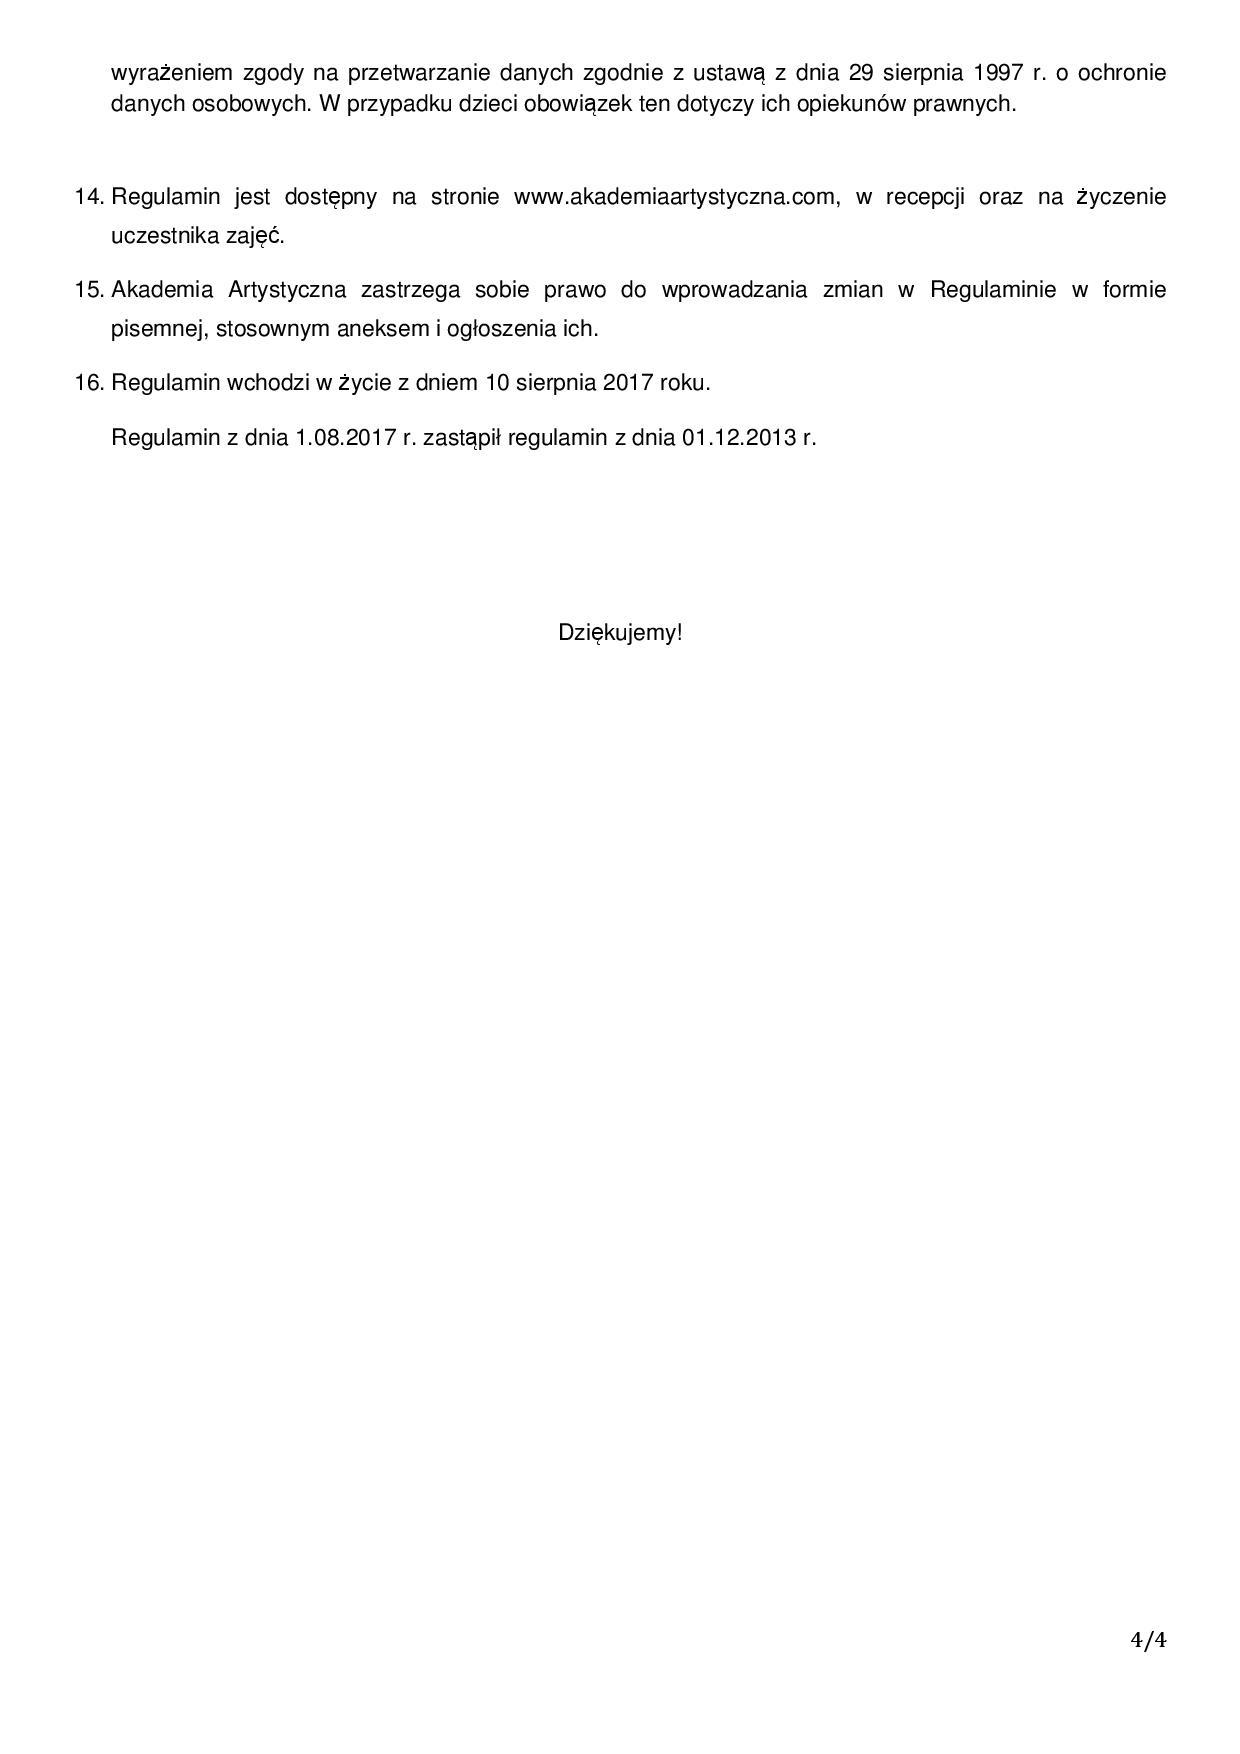 Regulamin Akademia Artystyczna4